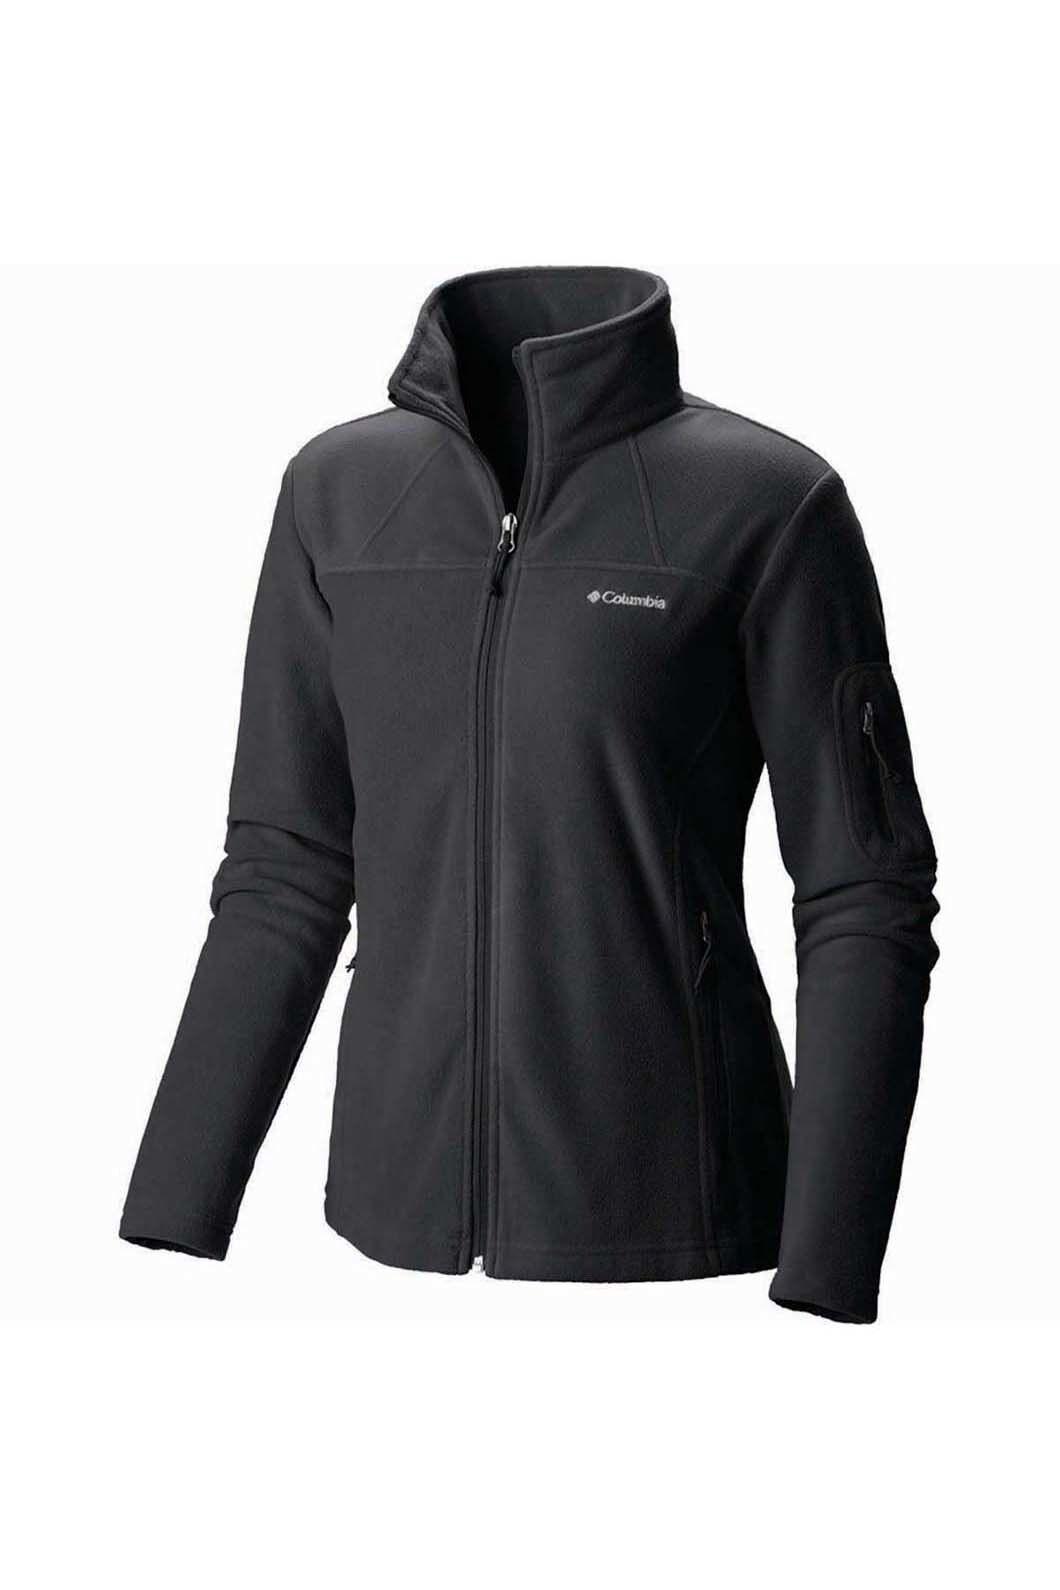 Columbia Women's Fast Trek II Jacket, Black, hi-res